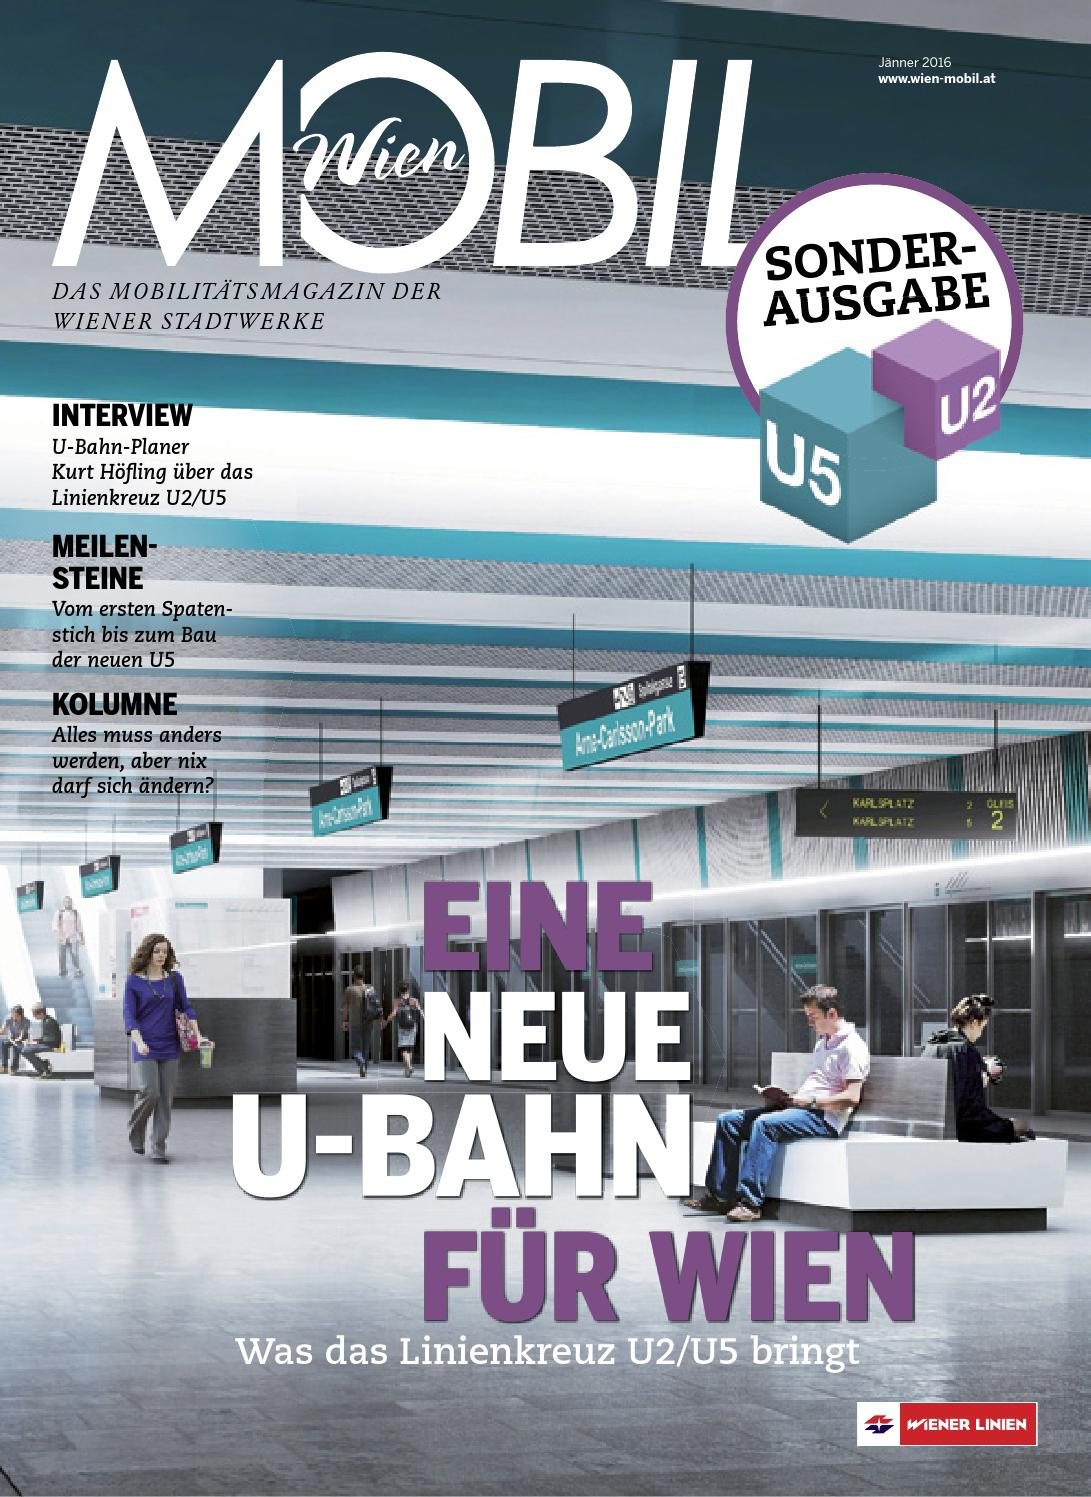 Wien Mobil Sonderausgabe by Wiener Linien - issuu